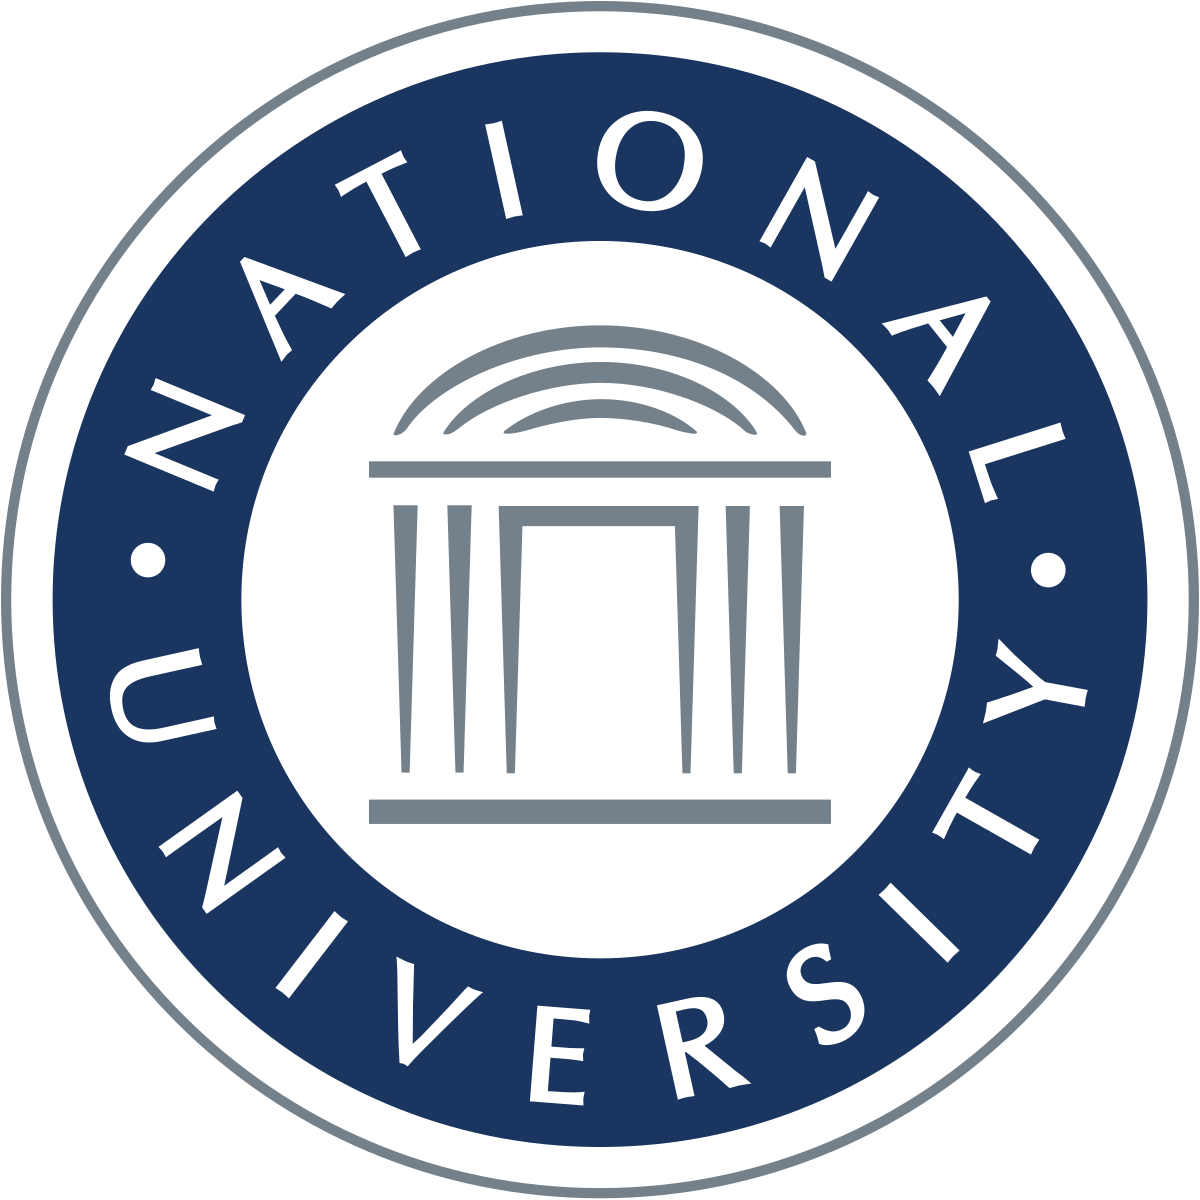 National University (California).